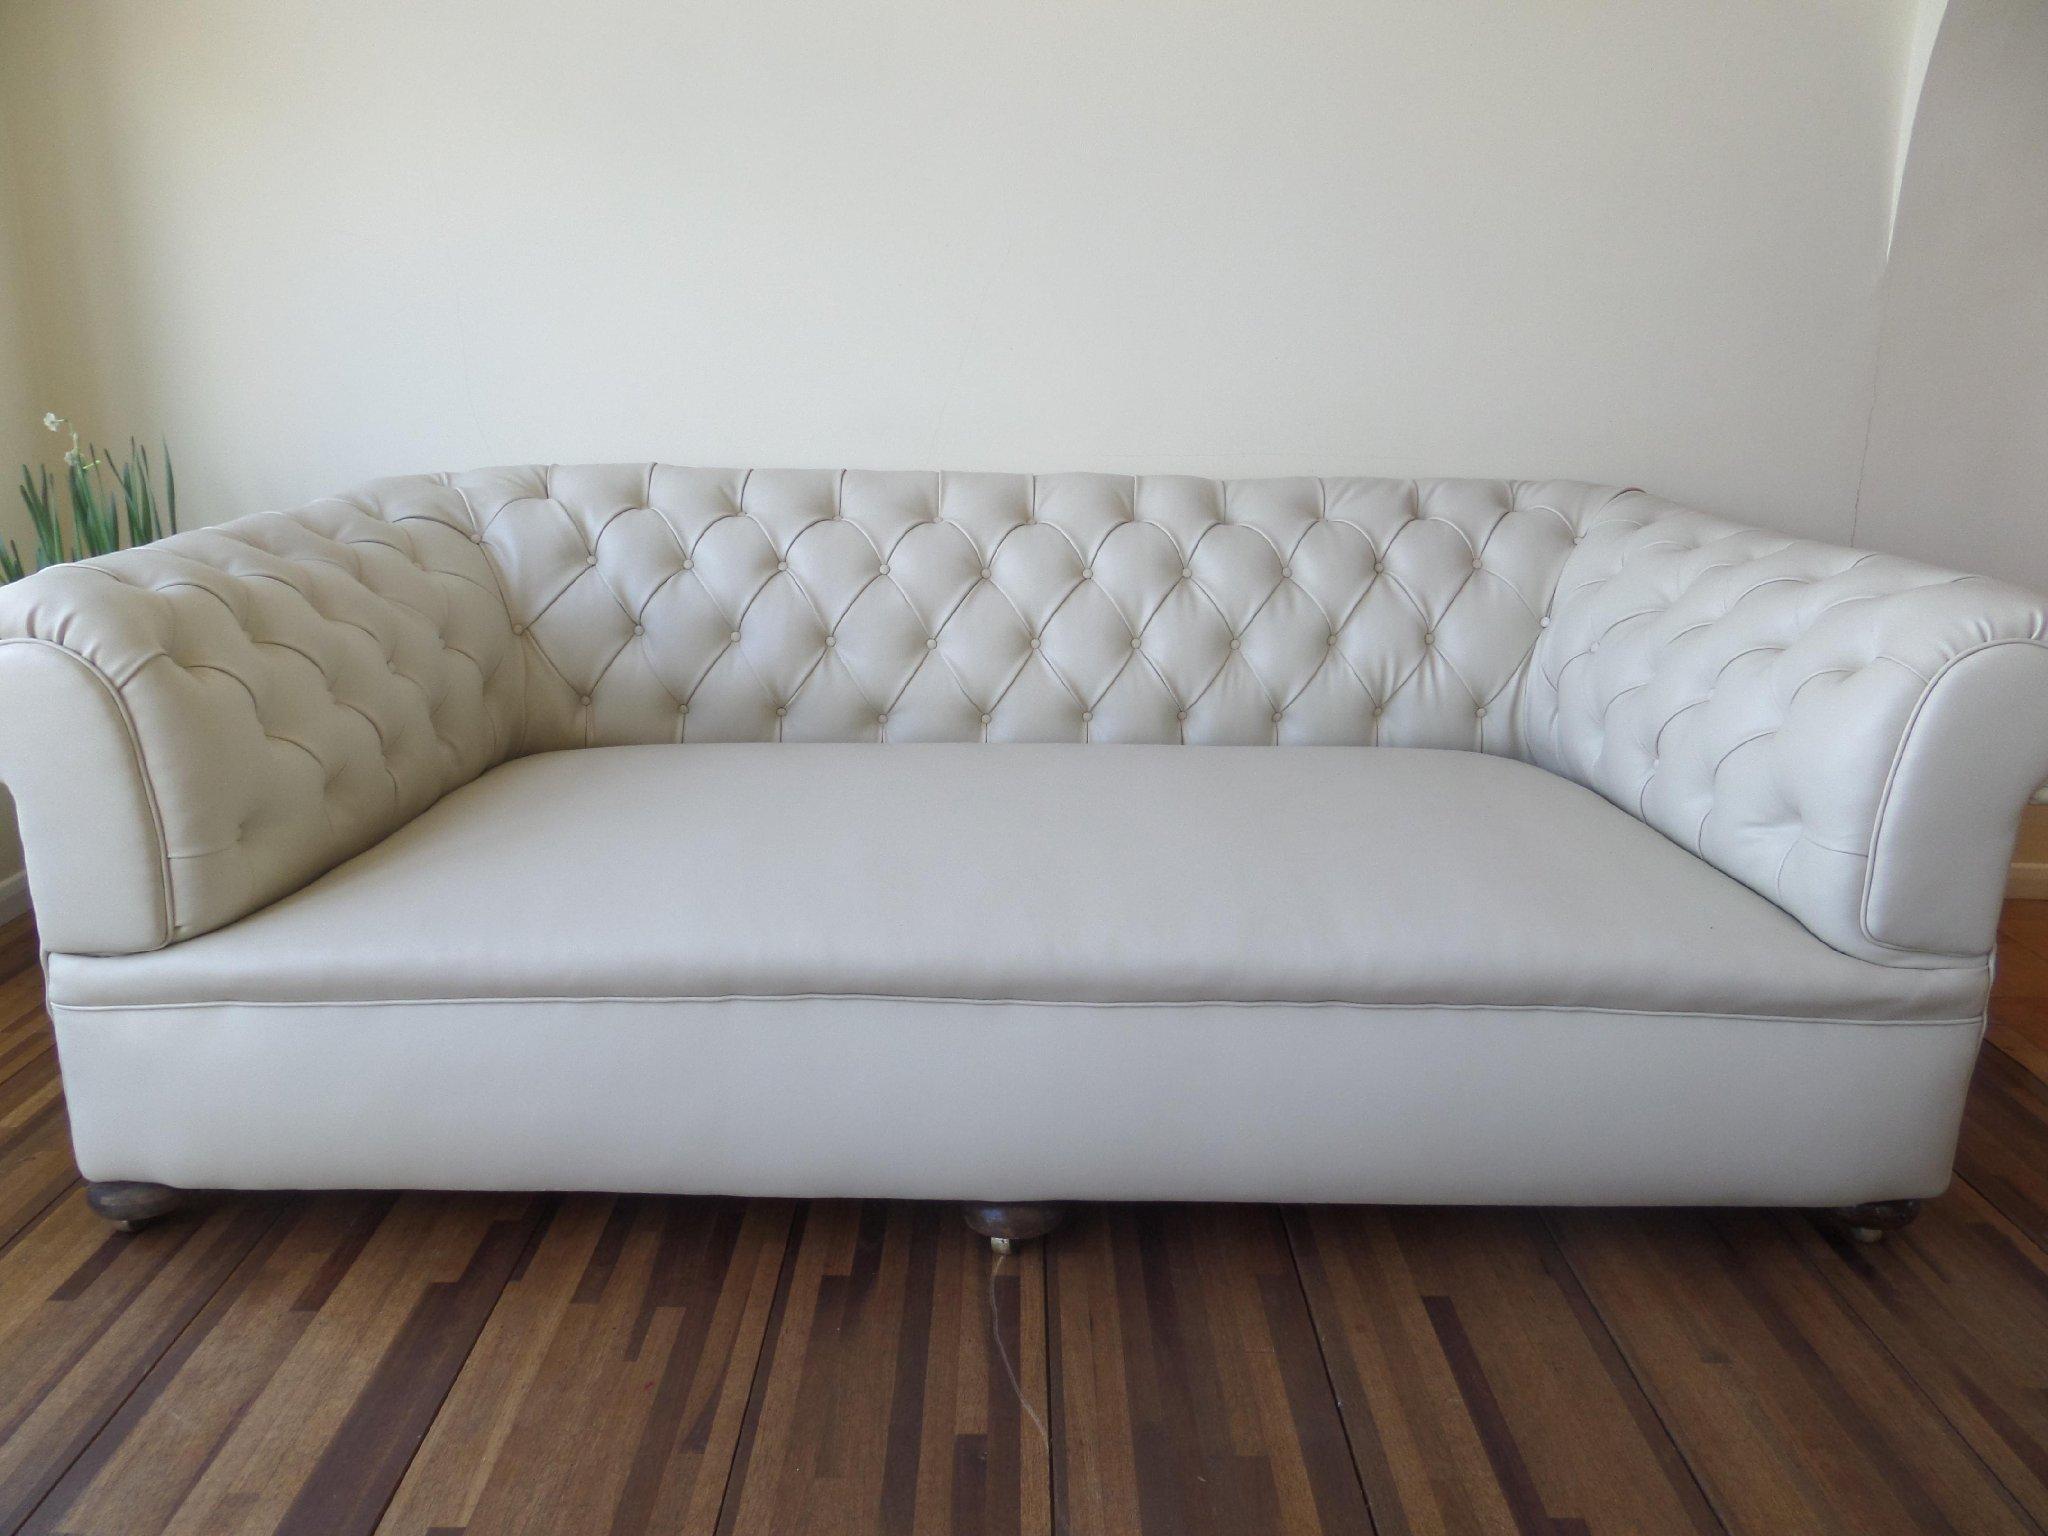 Home garden furniture in norwich infobel united for Furniture norwich